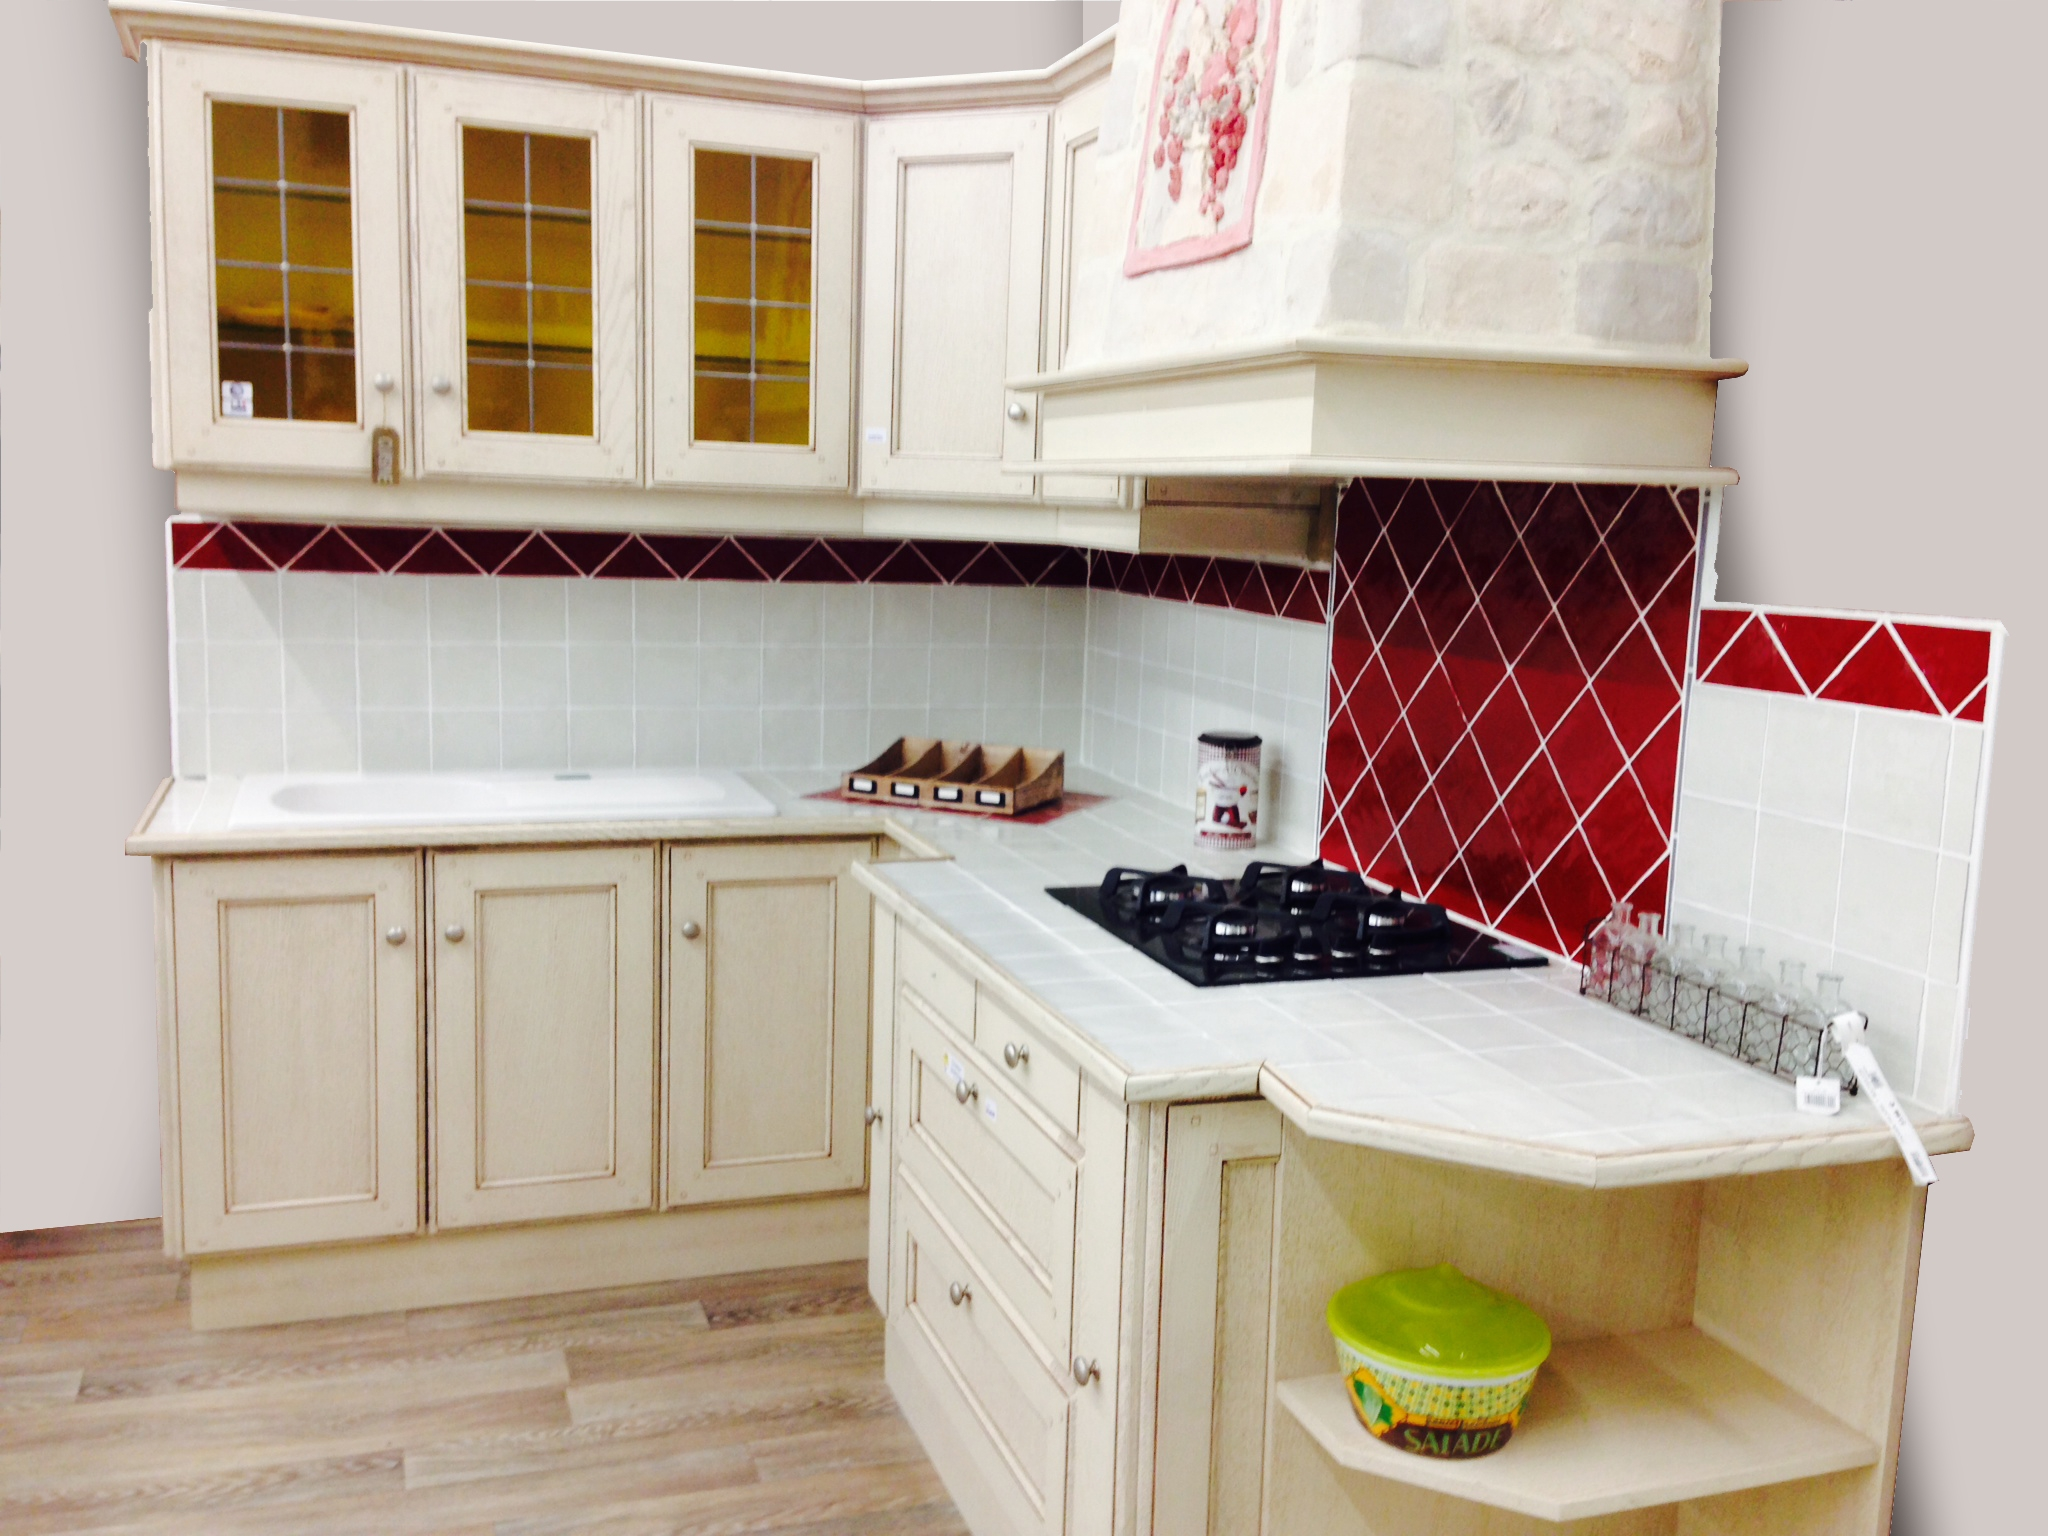 abc direct cuisine menuisier caen. Black Bedroom Furniture Sets. Home Design Ideas